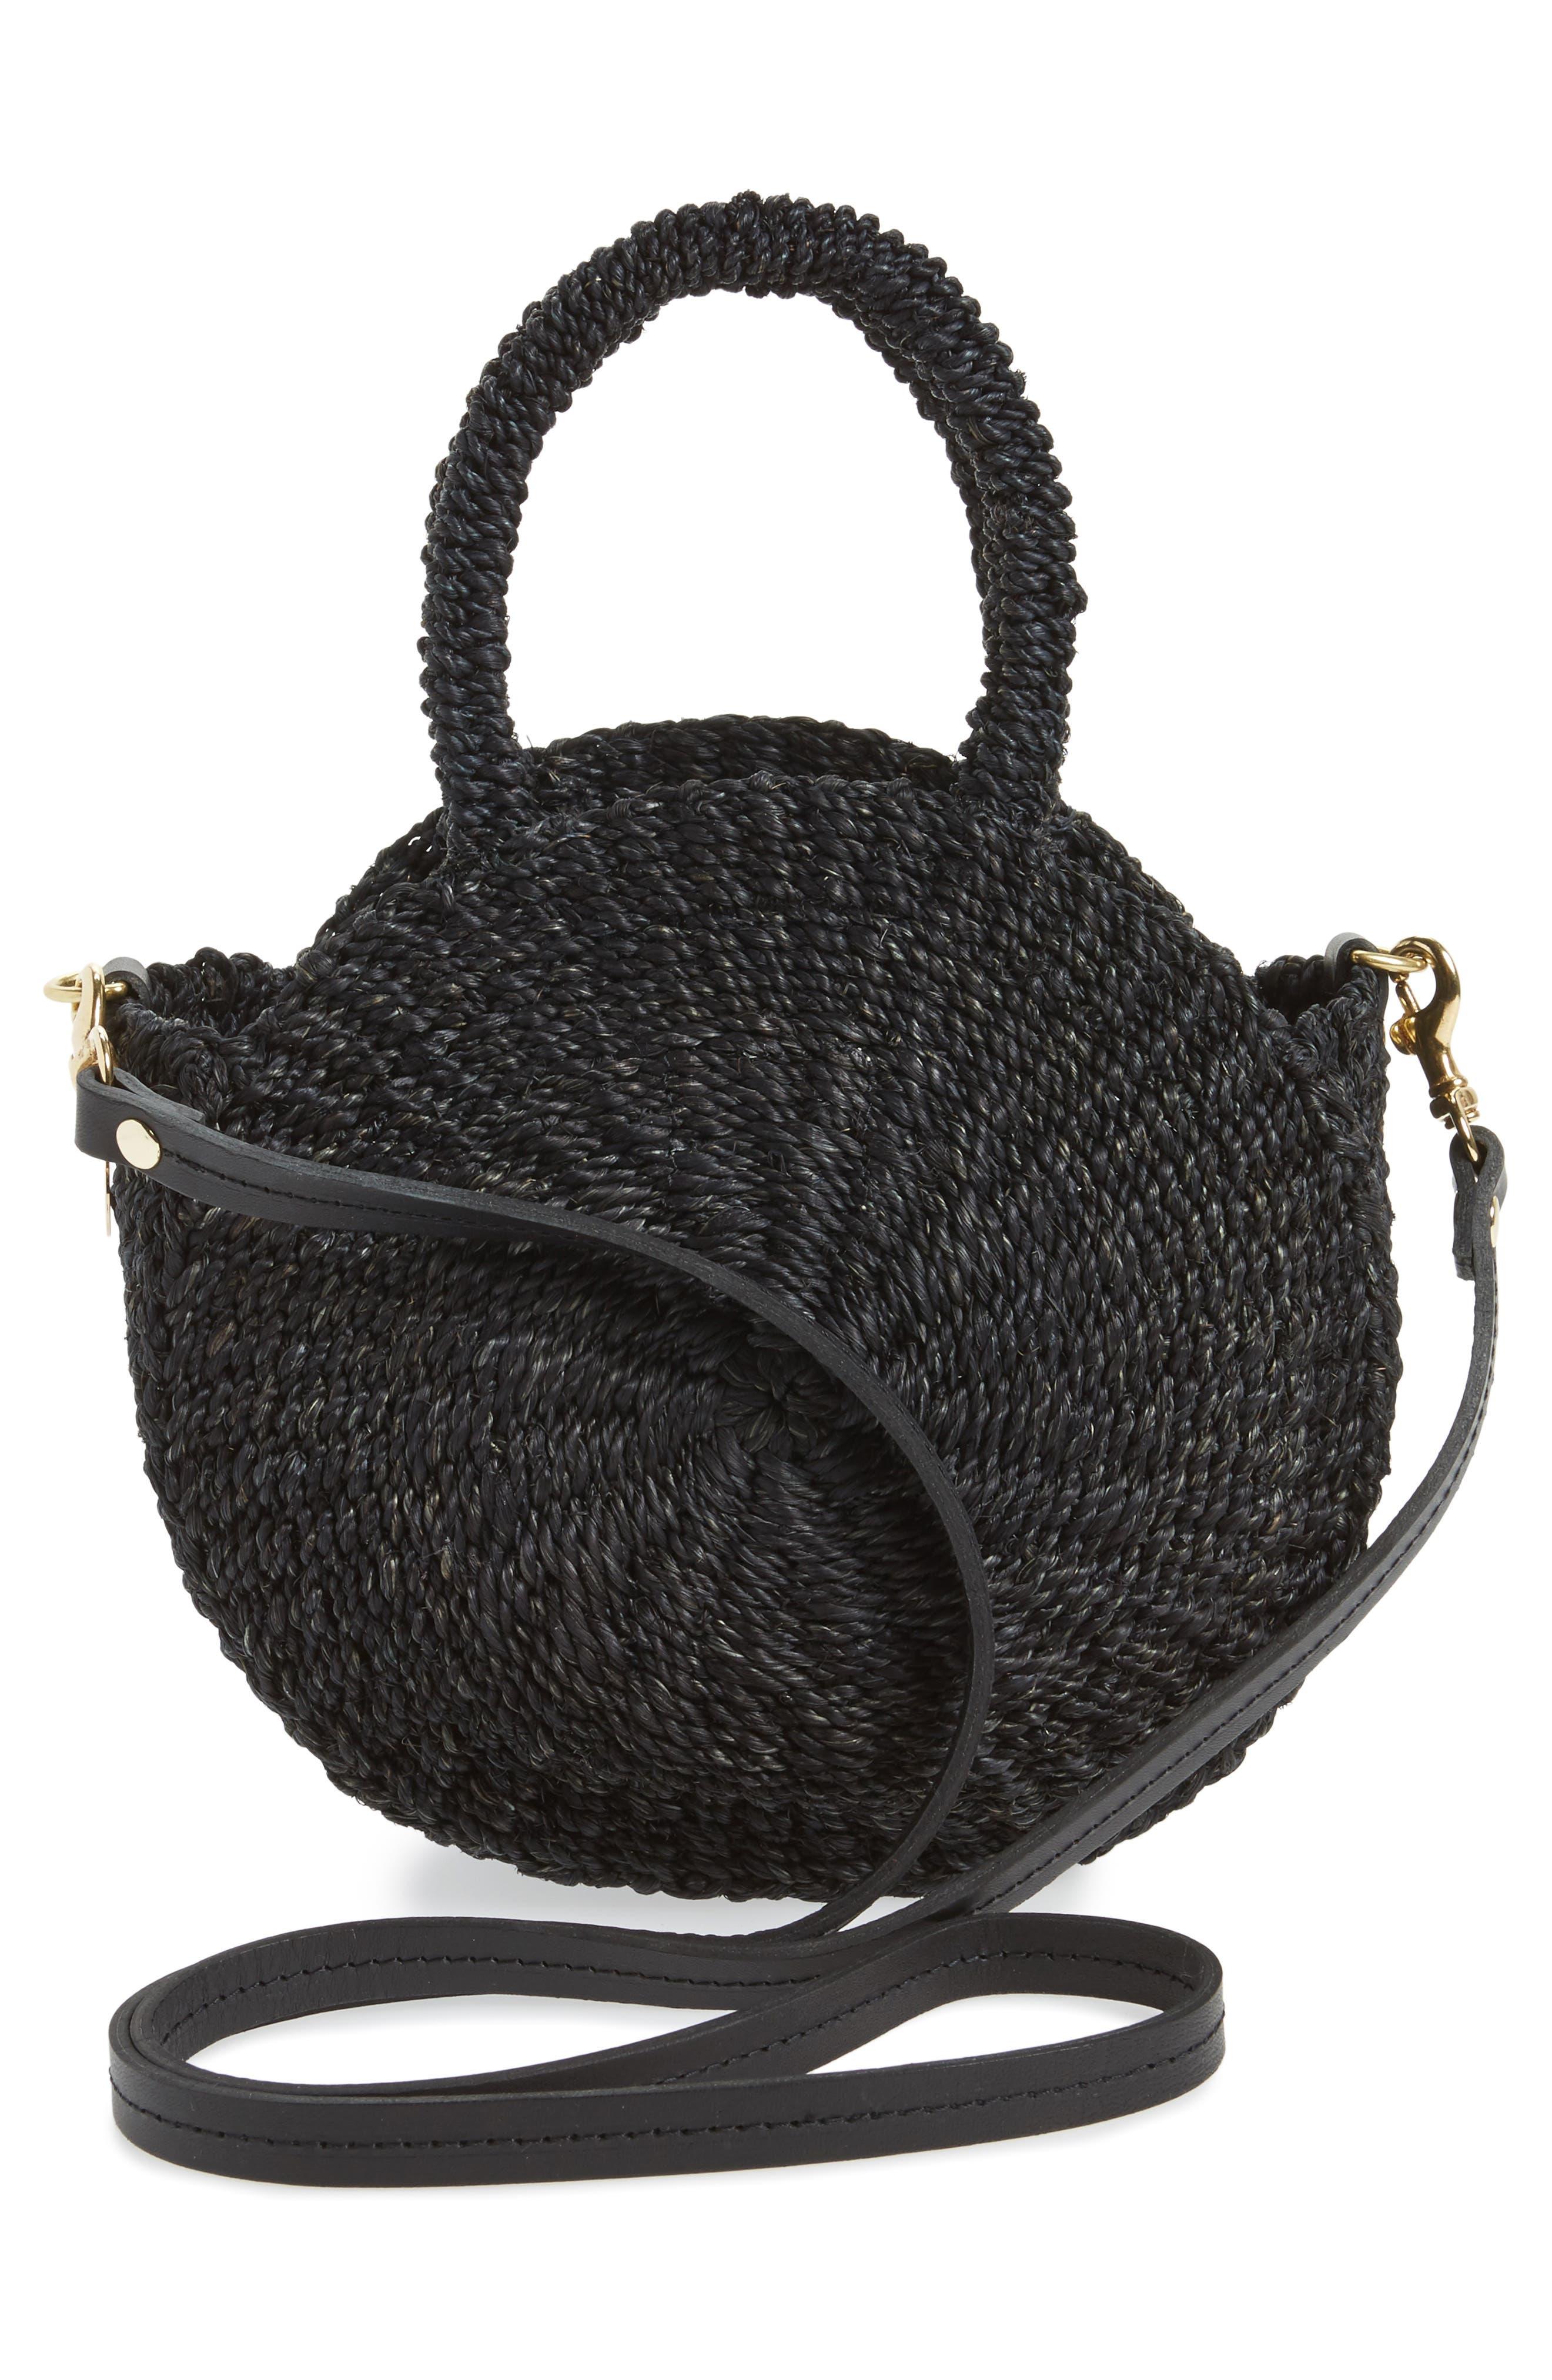 Petite Alice Straw Bag,                             Alternate thumbnail 3, color,                             BLACK WOVEN